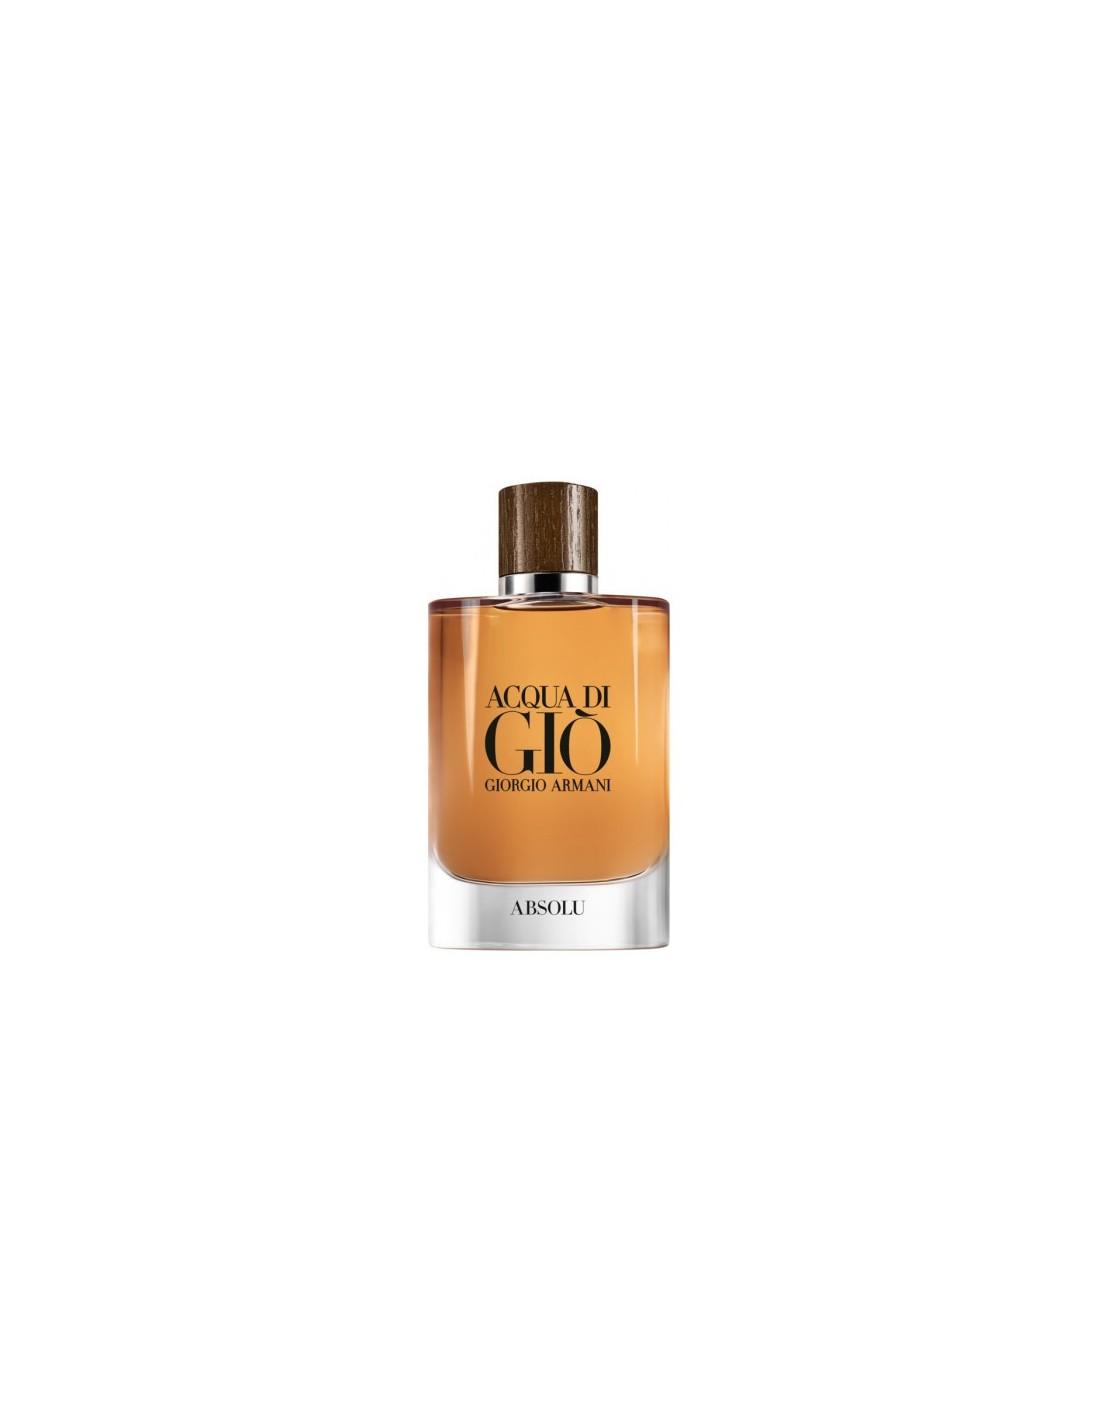 Armani Acqua di Gio  Absolu Eau De Parfum 75 ml Spray - TESTER ... 83633cbb722ca